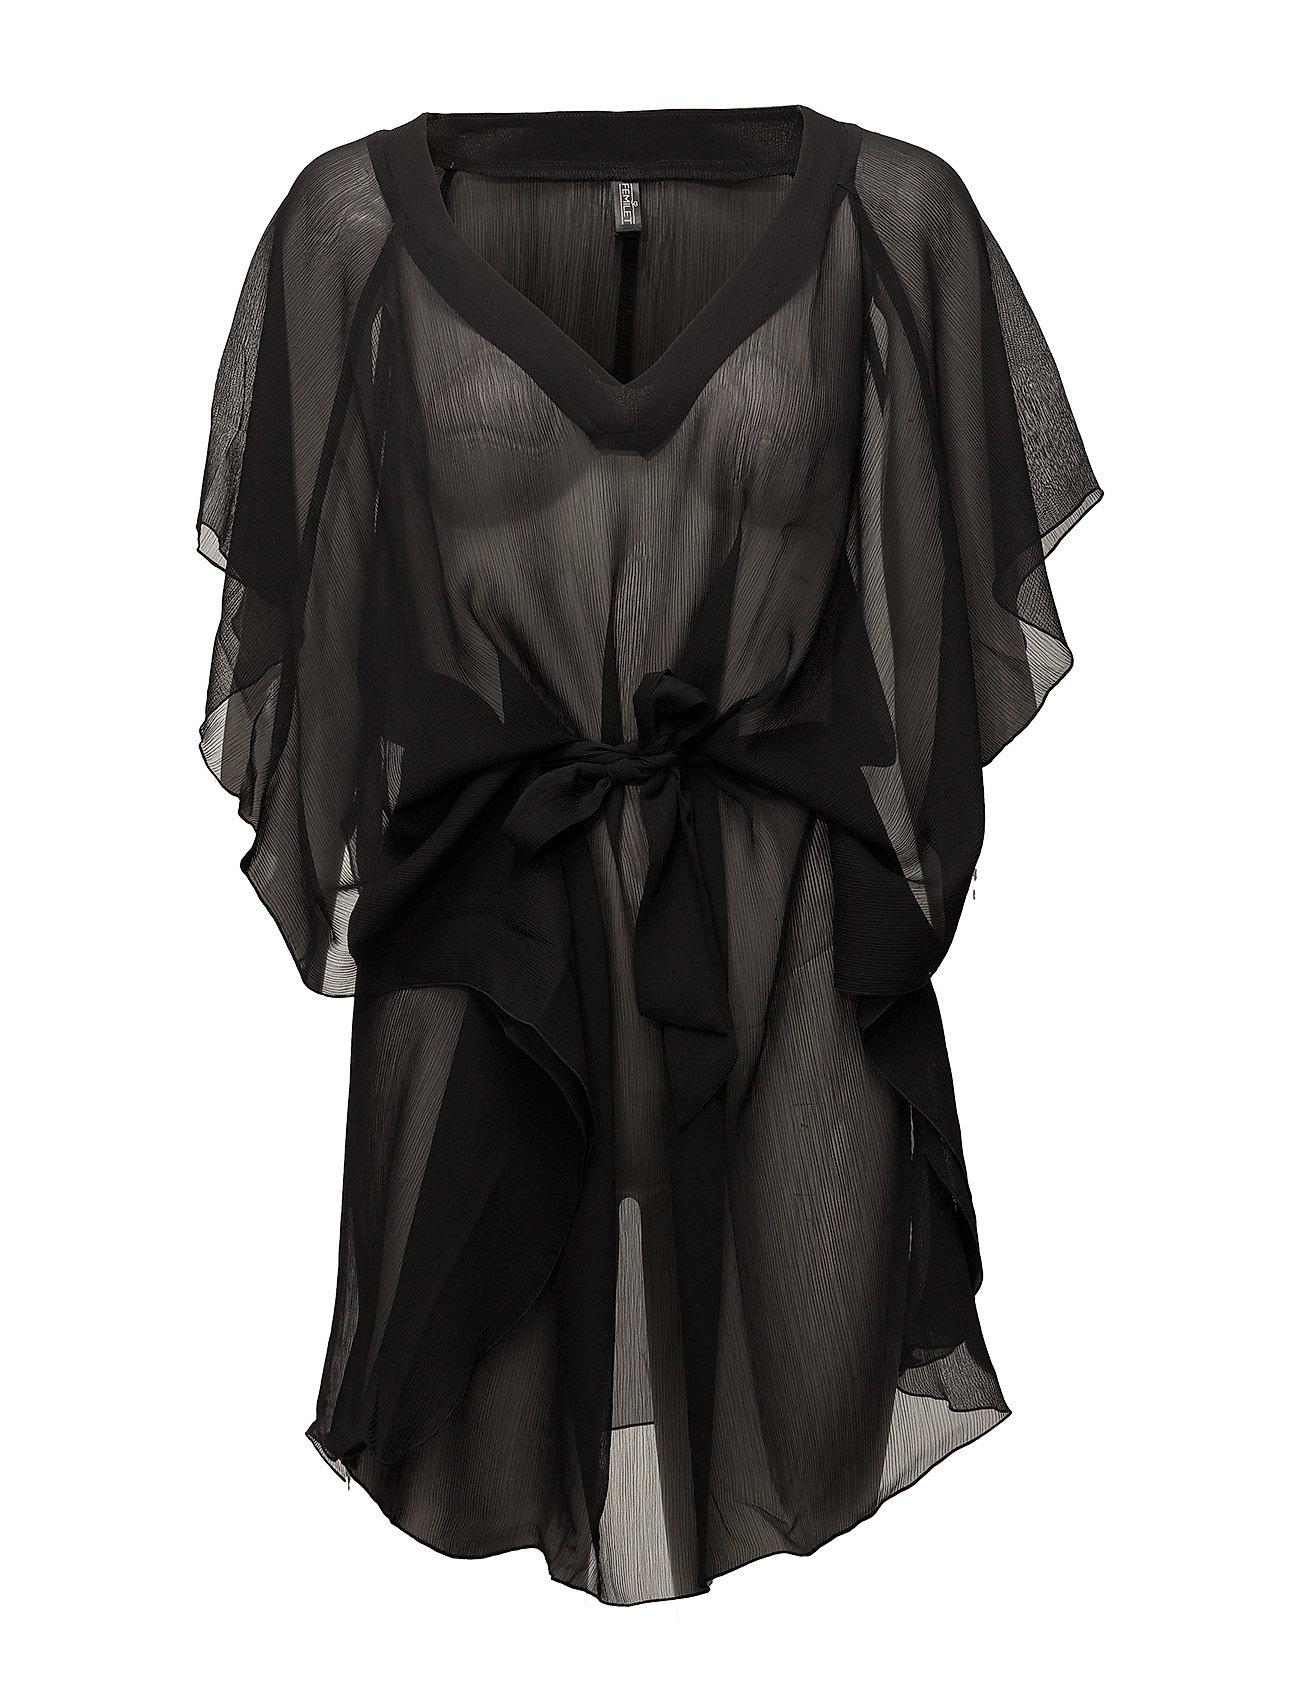 Femilet Bora - Dress